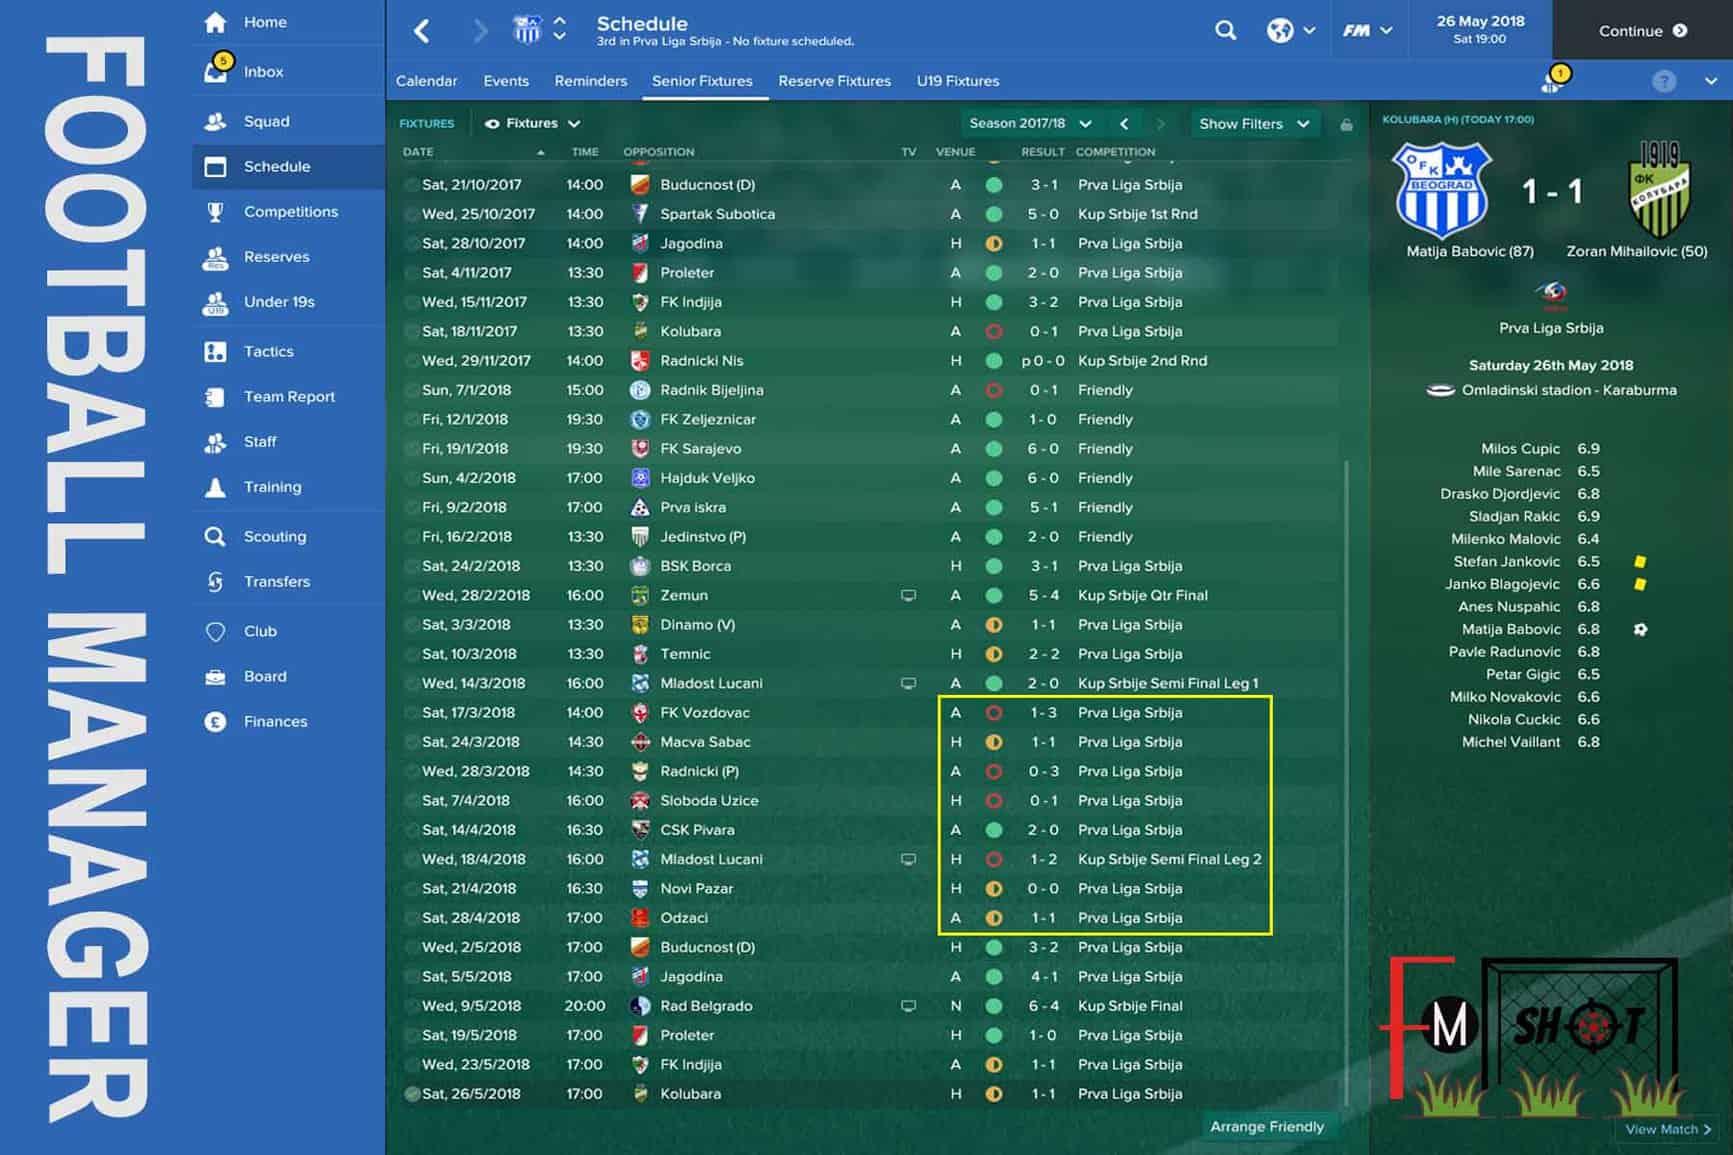 Senior Fixtures